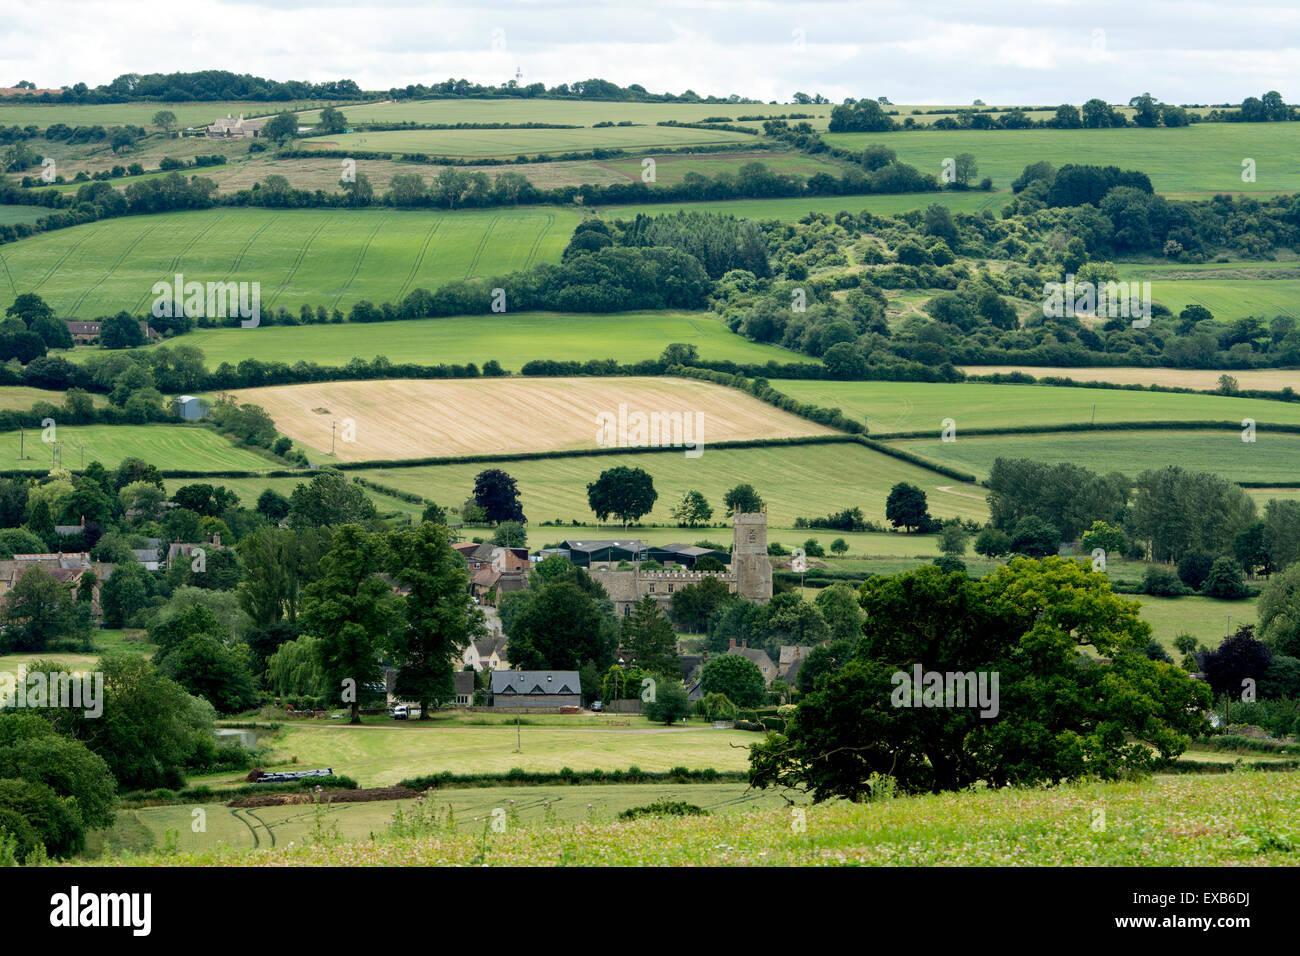 Landscape looking over Long Compton village, Warwickshire, England, UK - Stock Image